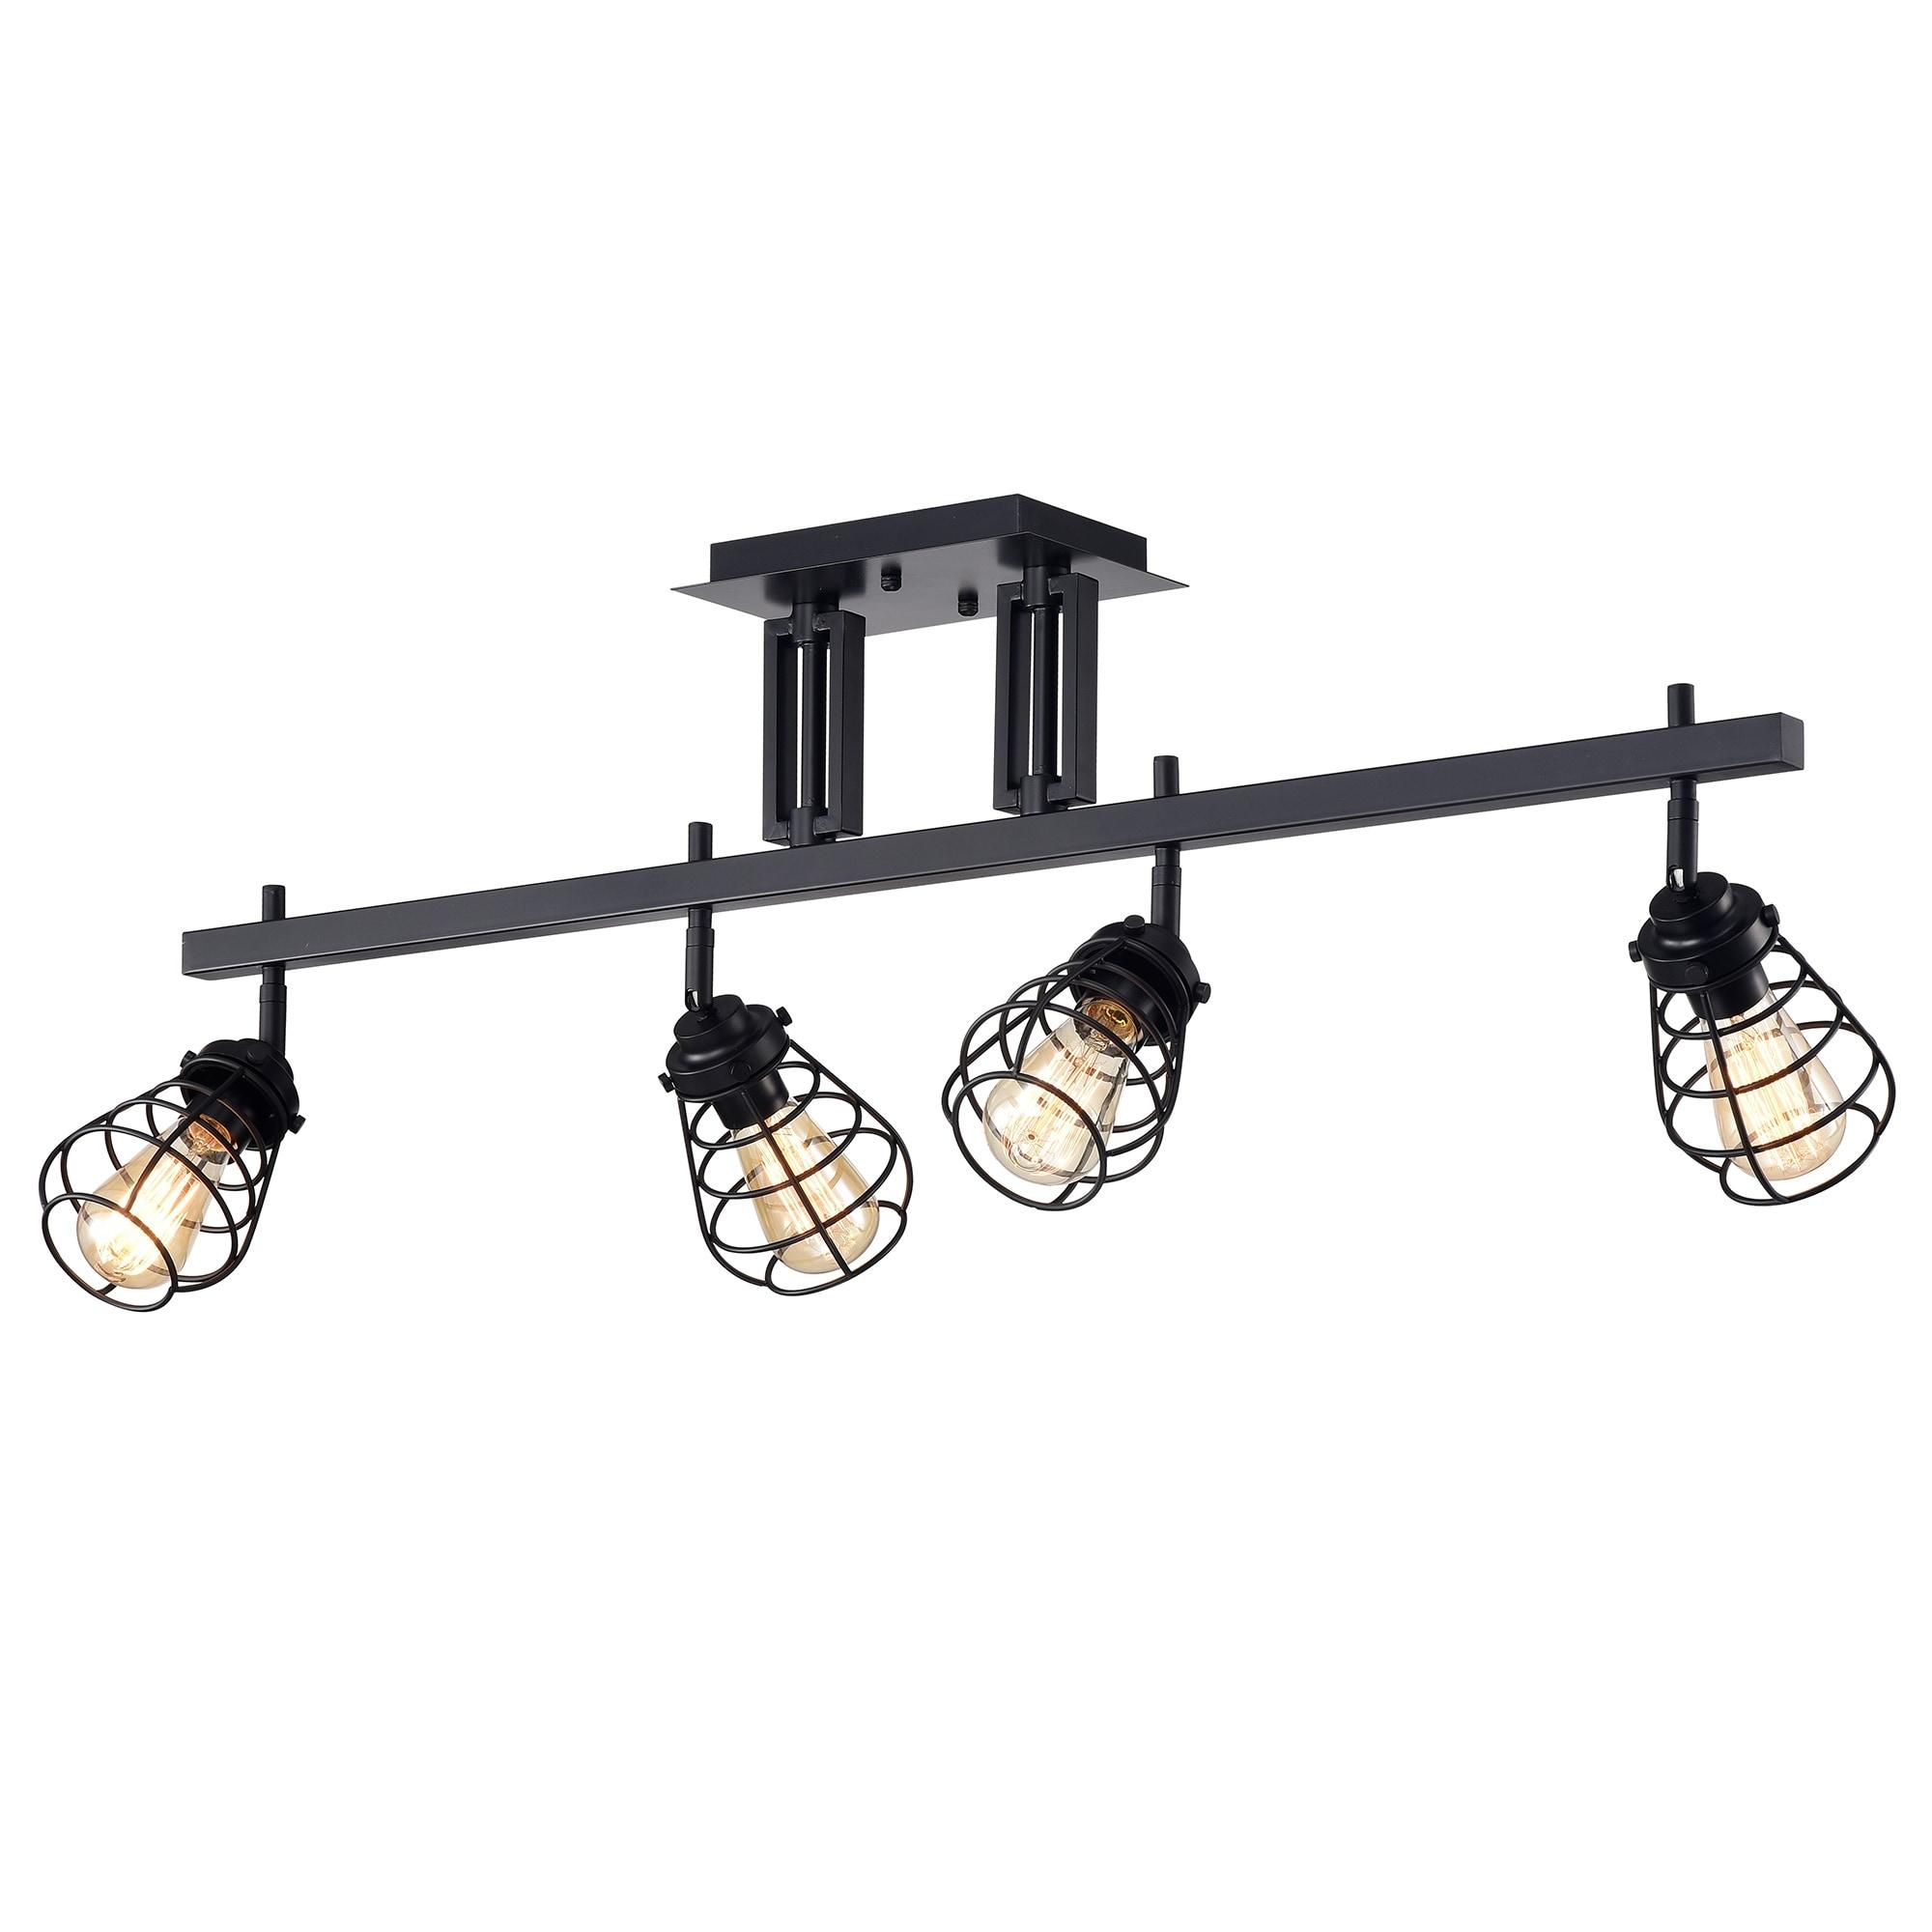 Zefina Matte Black 4 Light Track Light On Sale Overstock 28245032